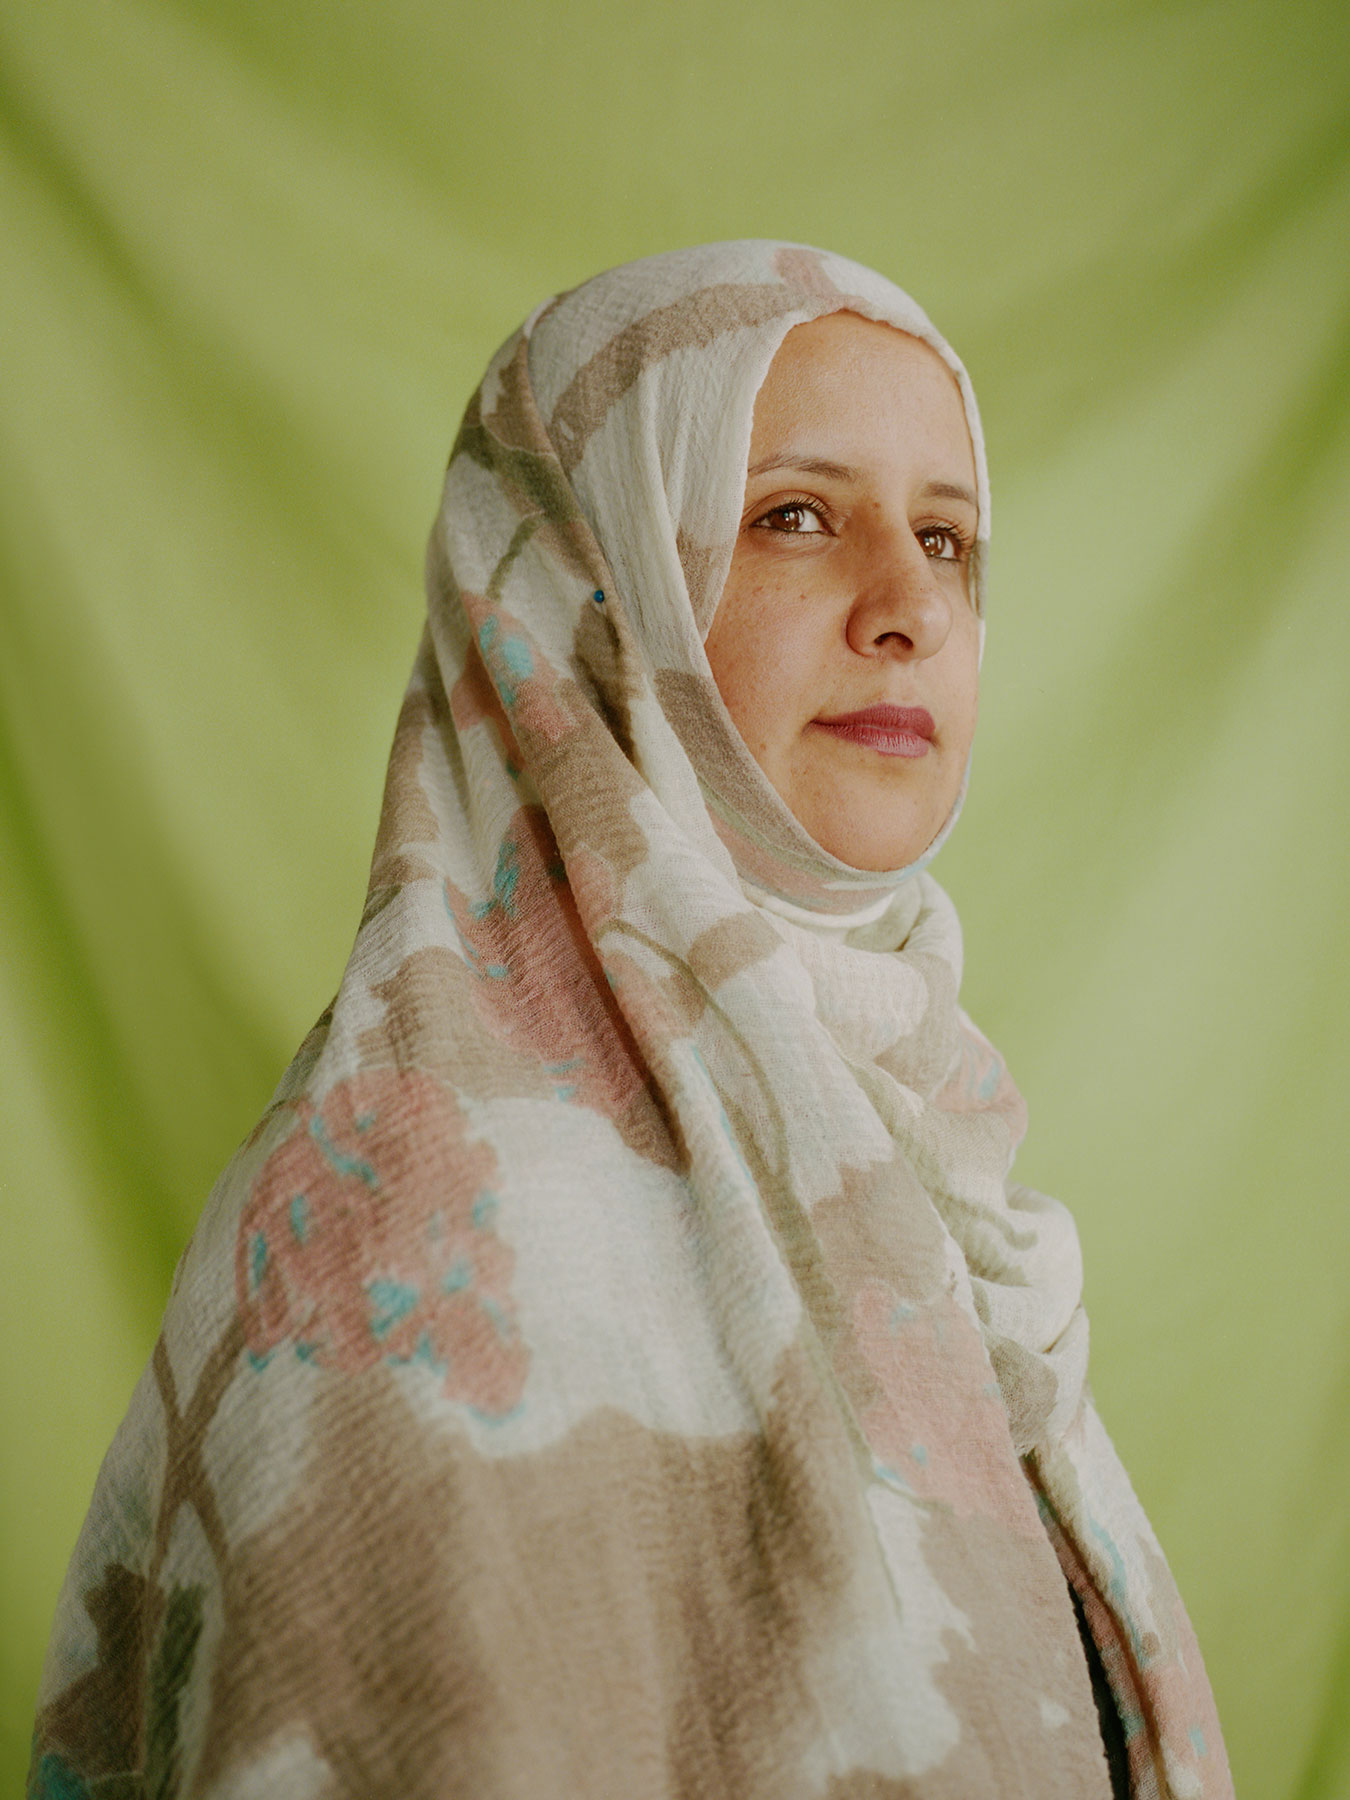 Yemeni human rights activist Radhya al-Mutawakel